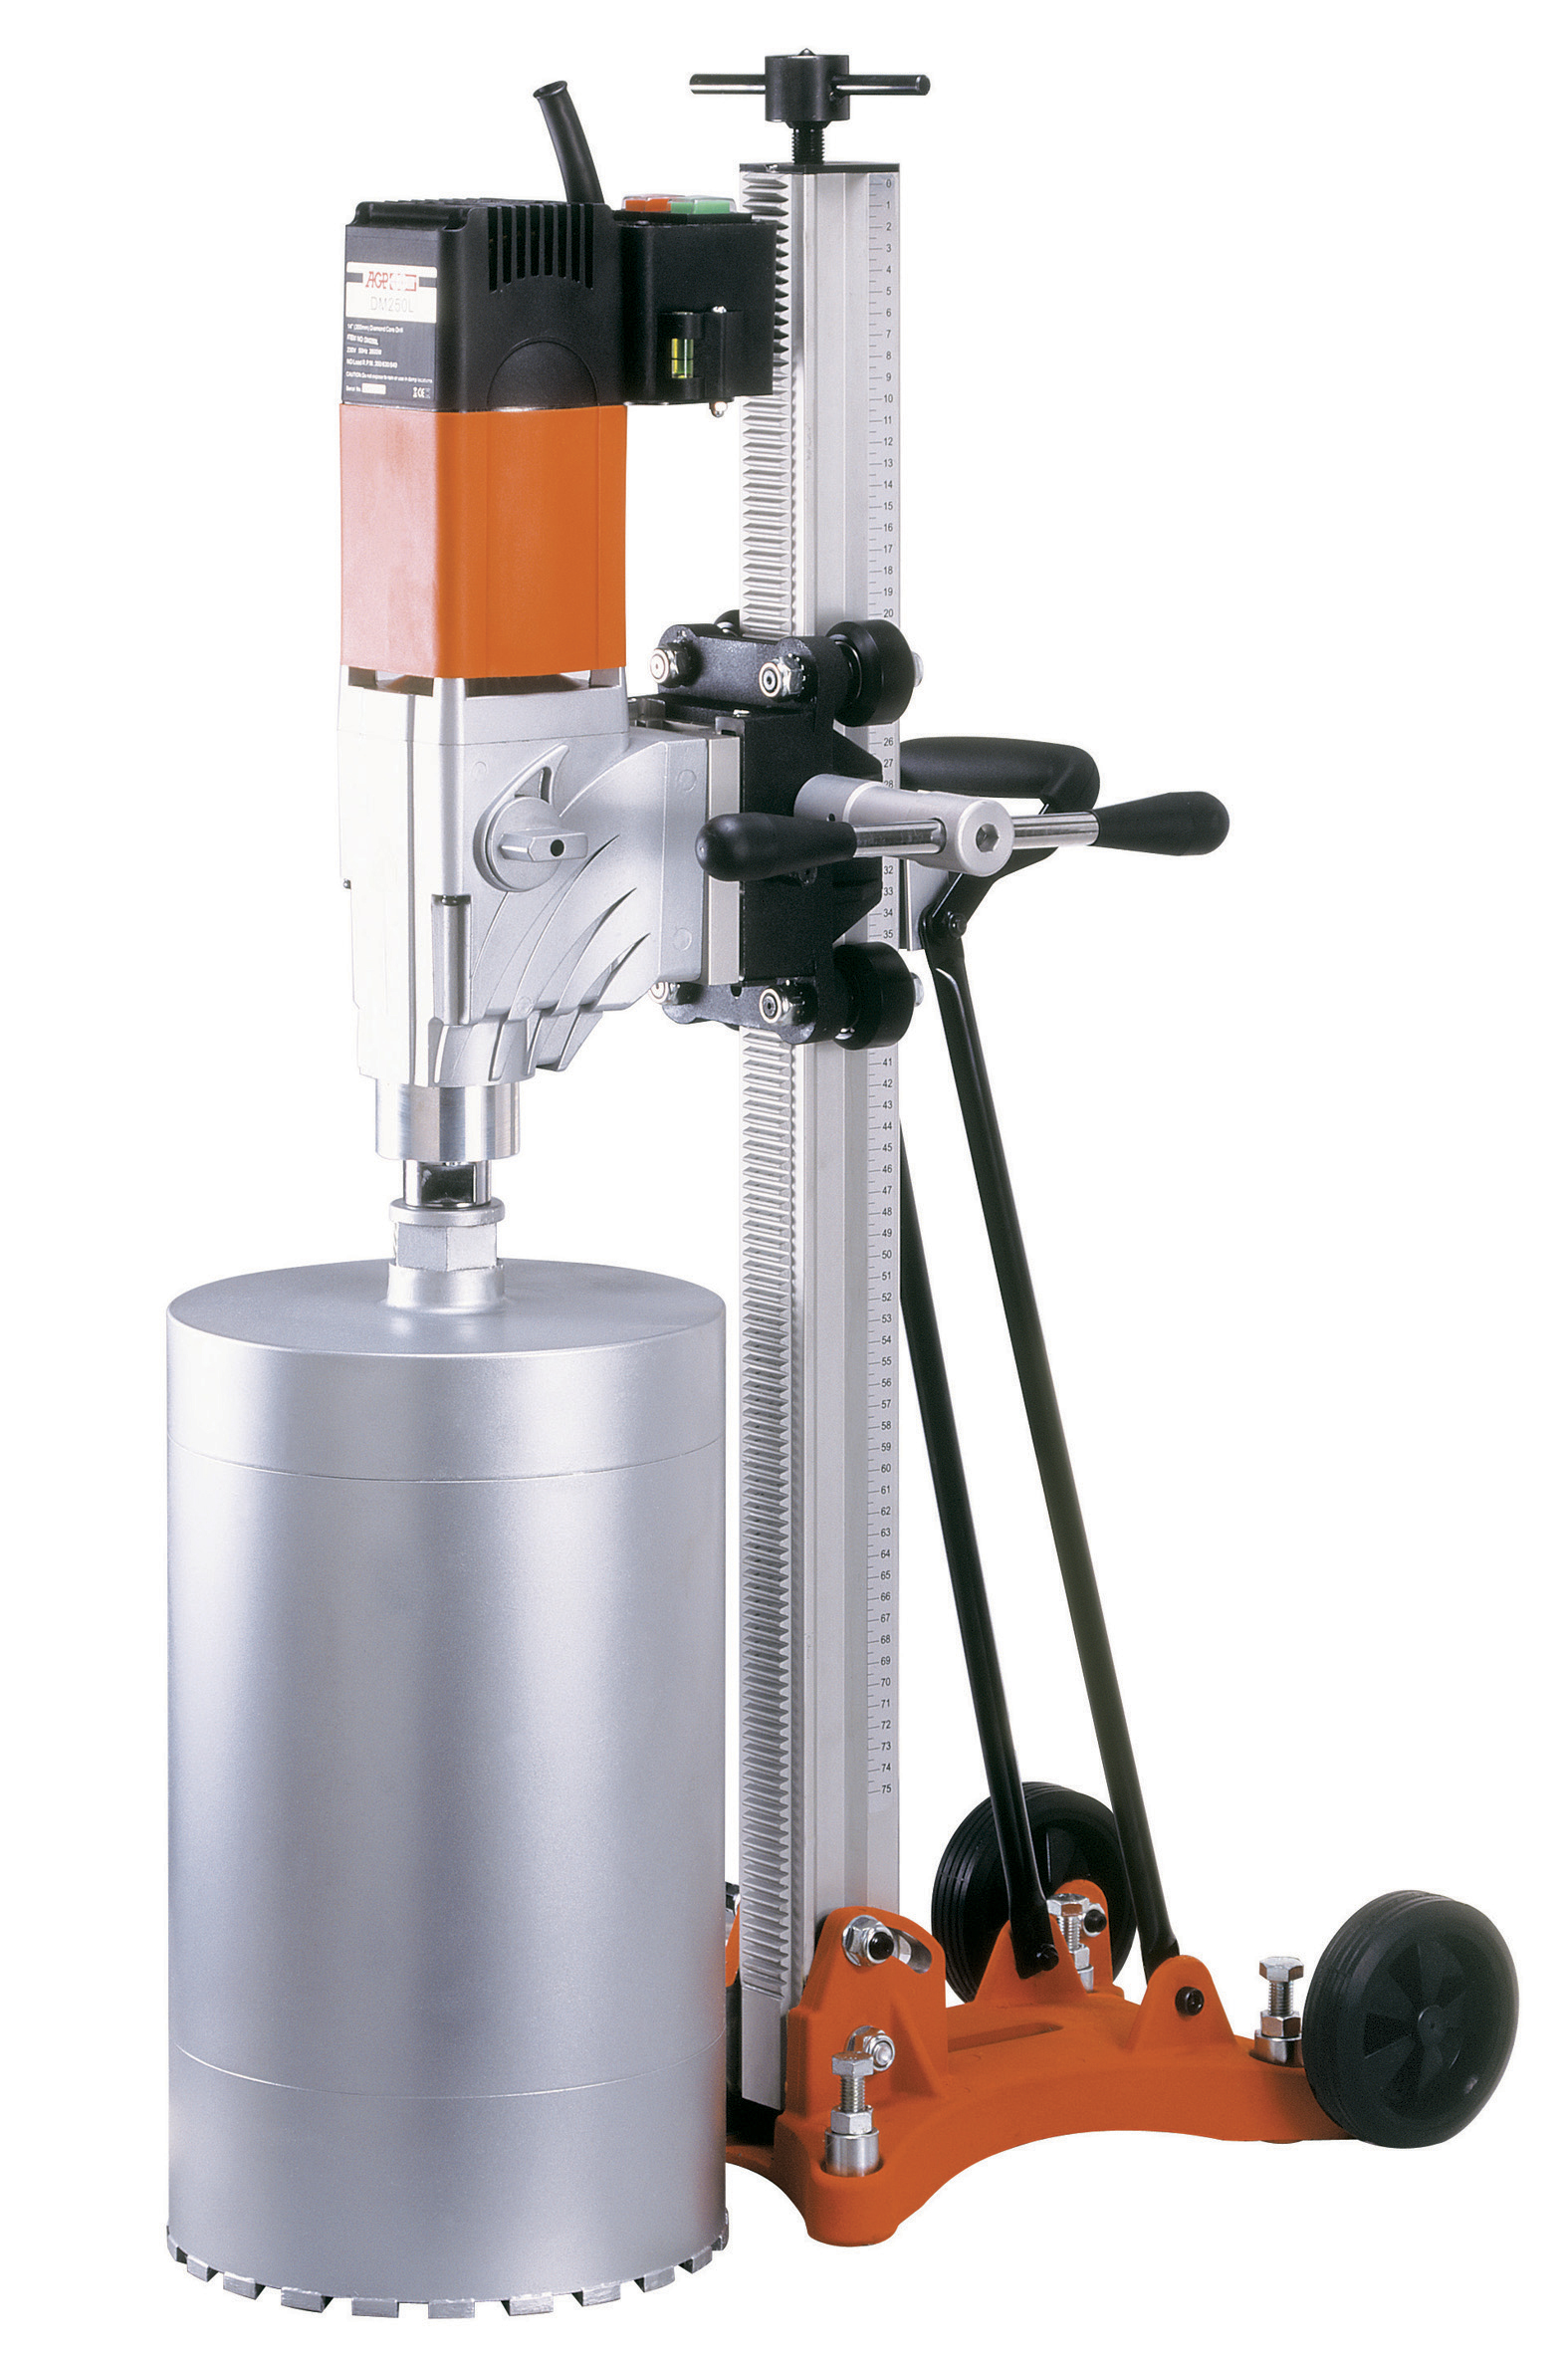 Taladro Testiguero AGP DM 250L